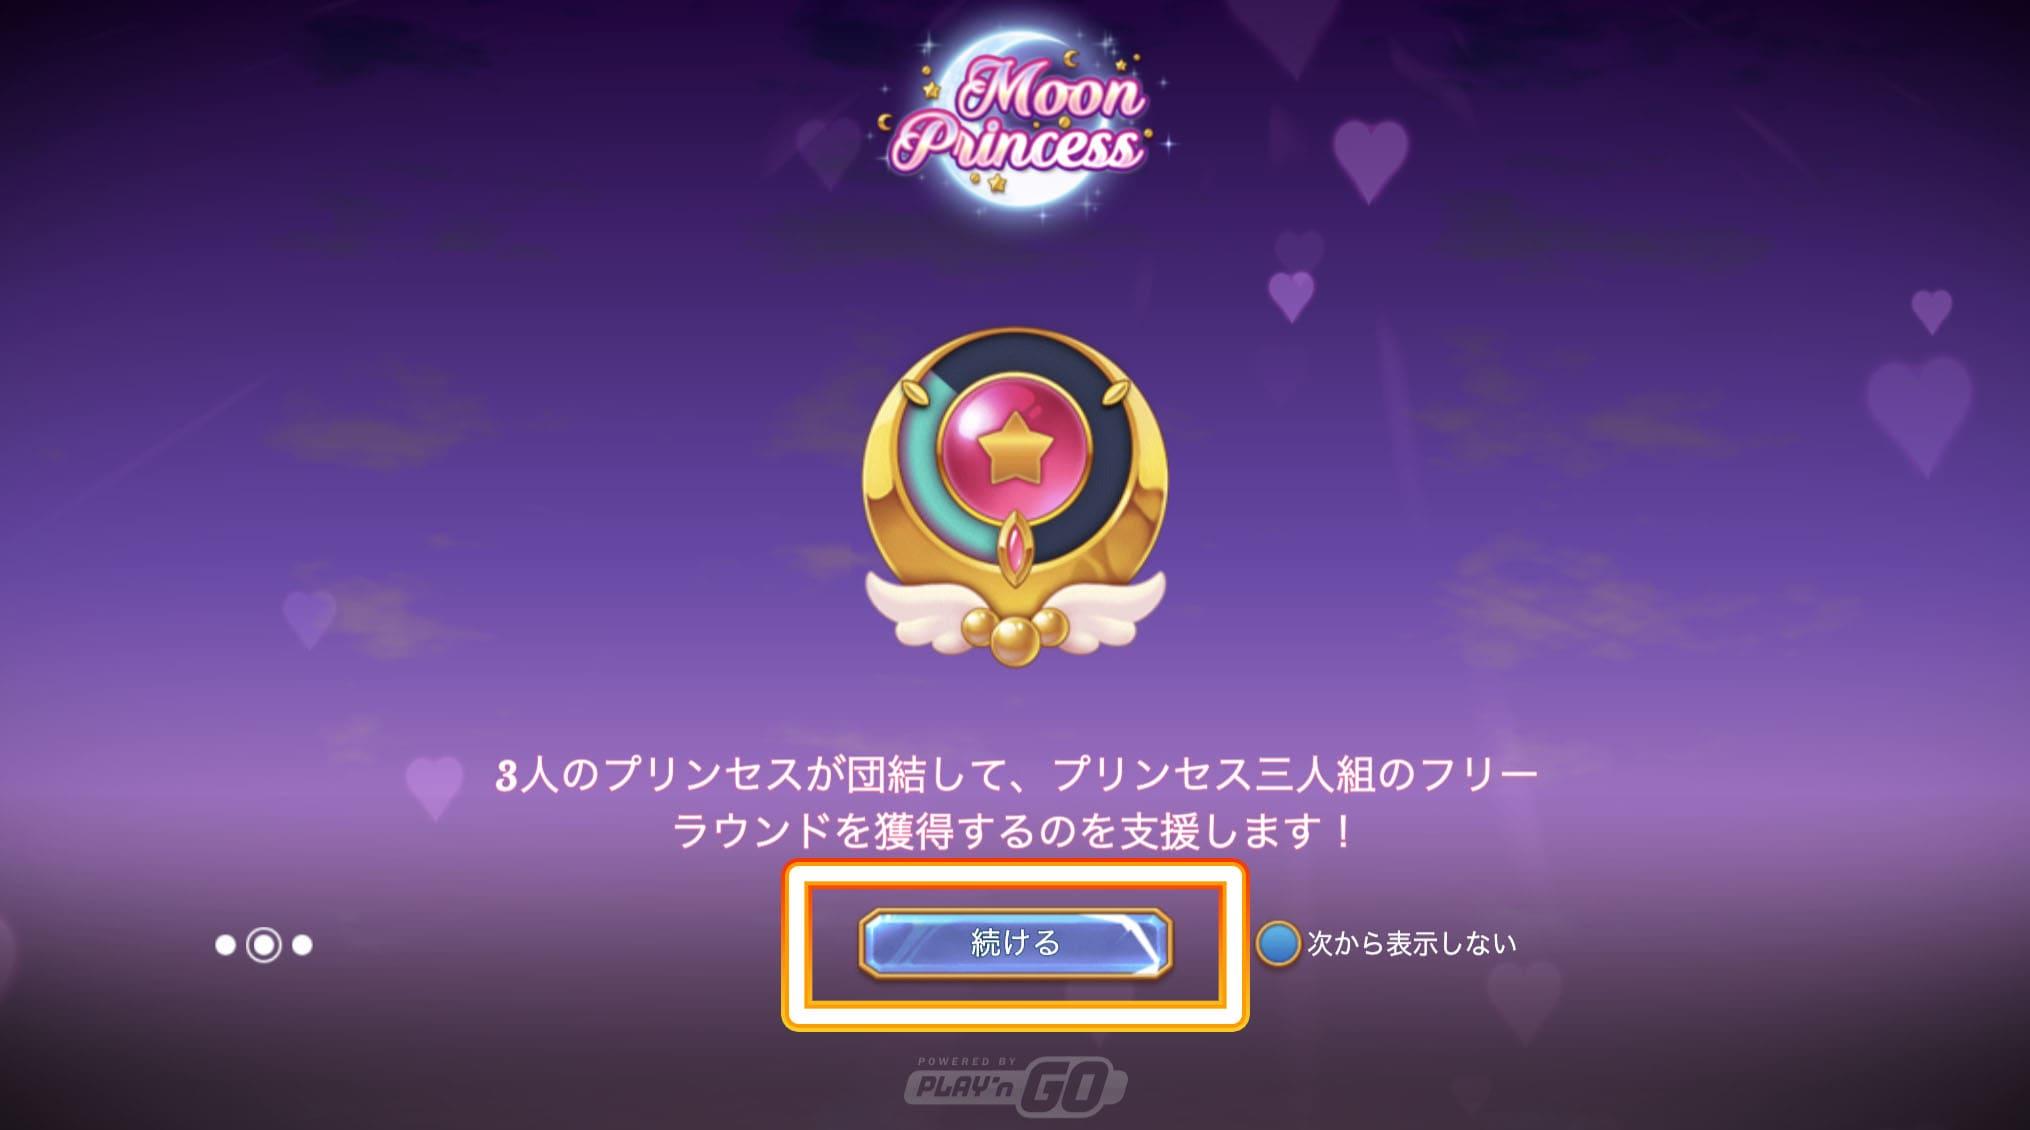 MoonPrincess最初の画面